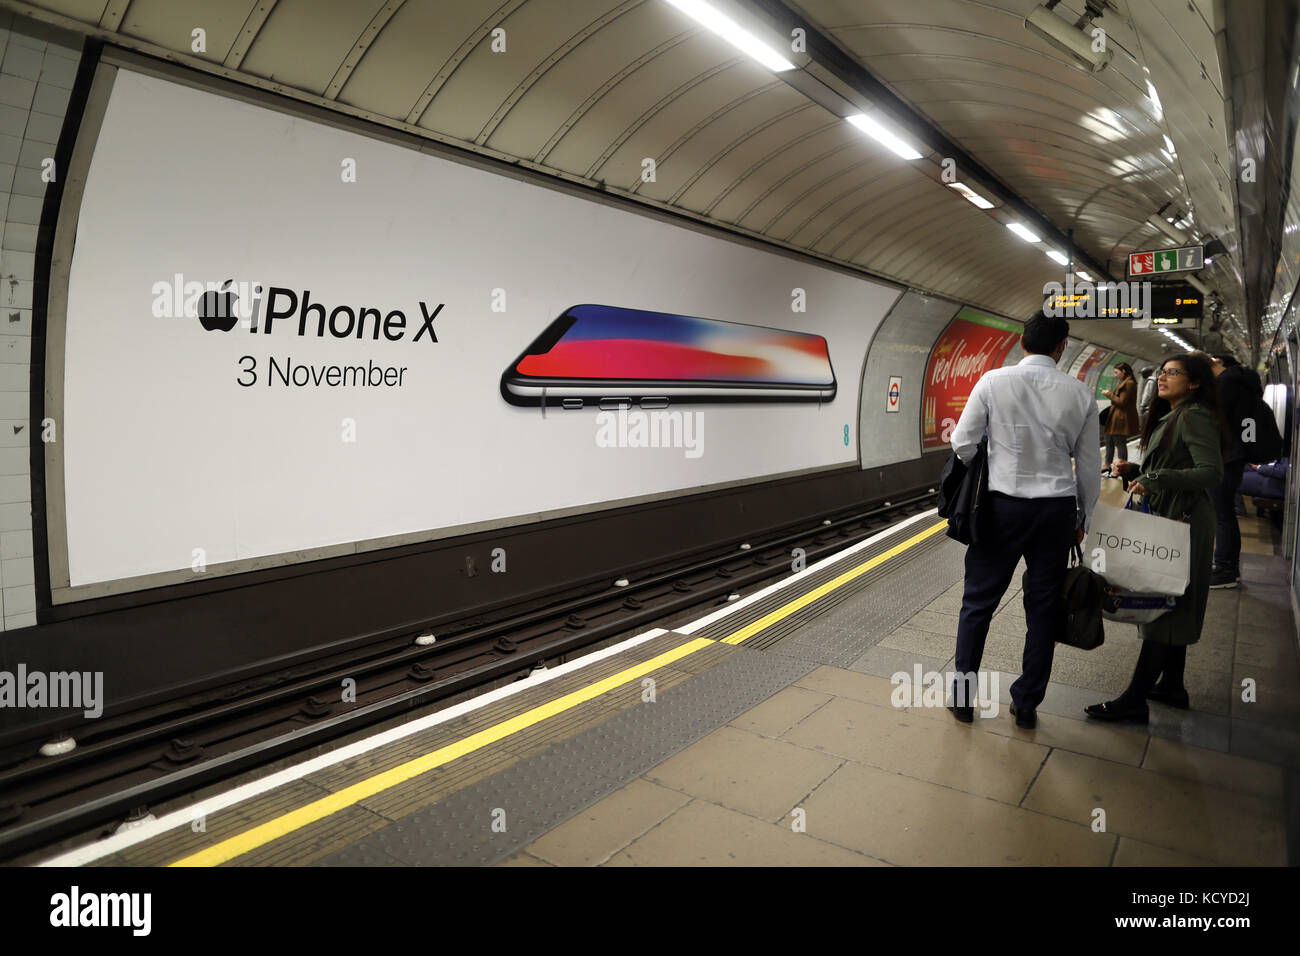 You Tube Advert Stock Photos & You Tube Advert Stock Images - Alamy